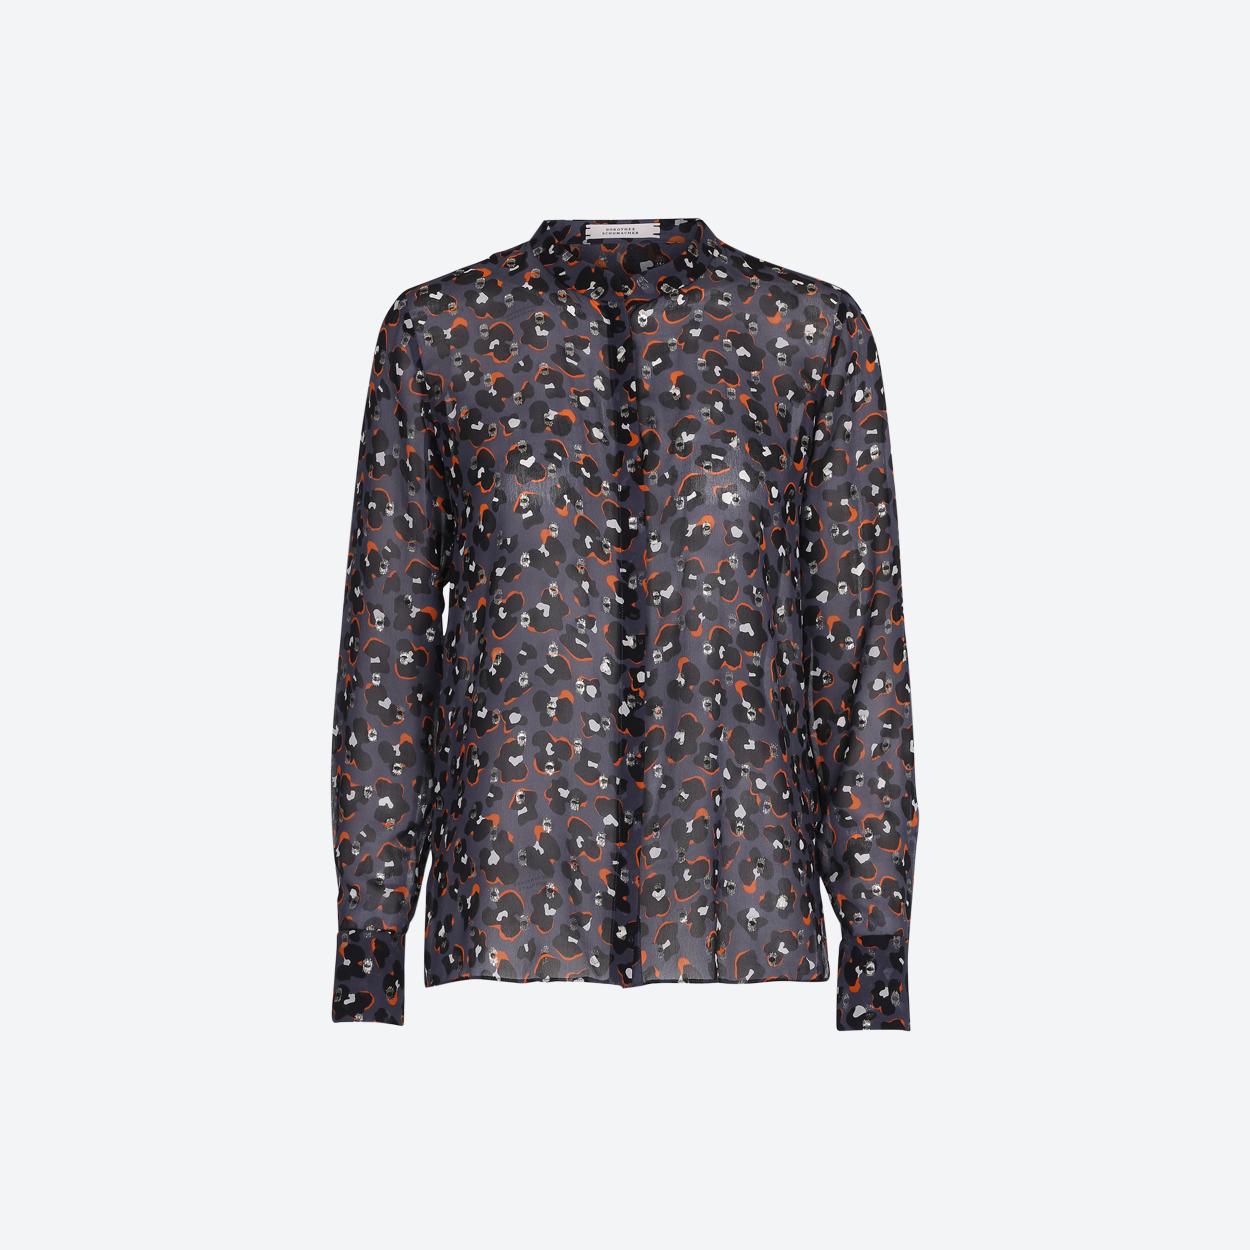 Dorothee Schumacher Delicate Dazzle skjorte